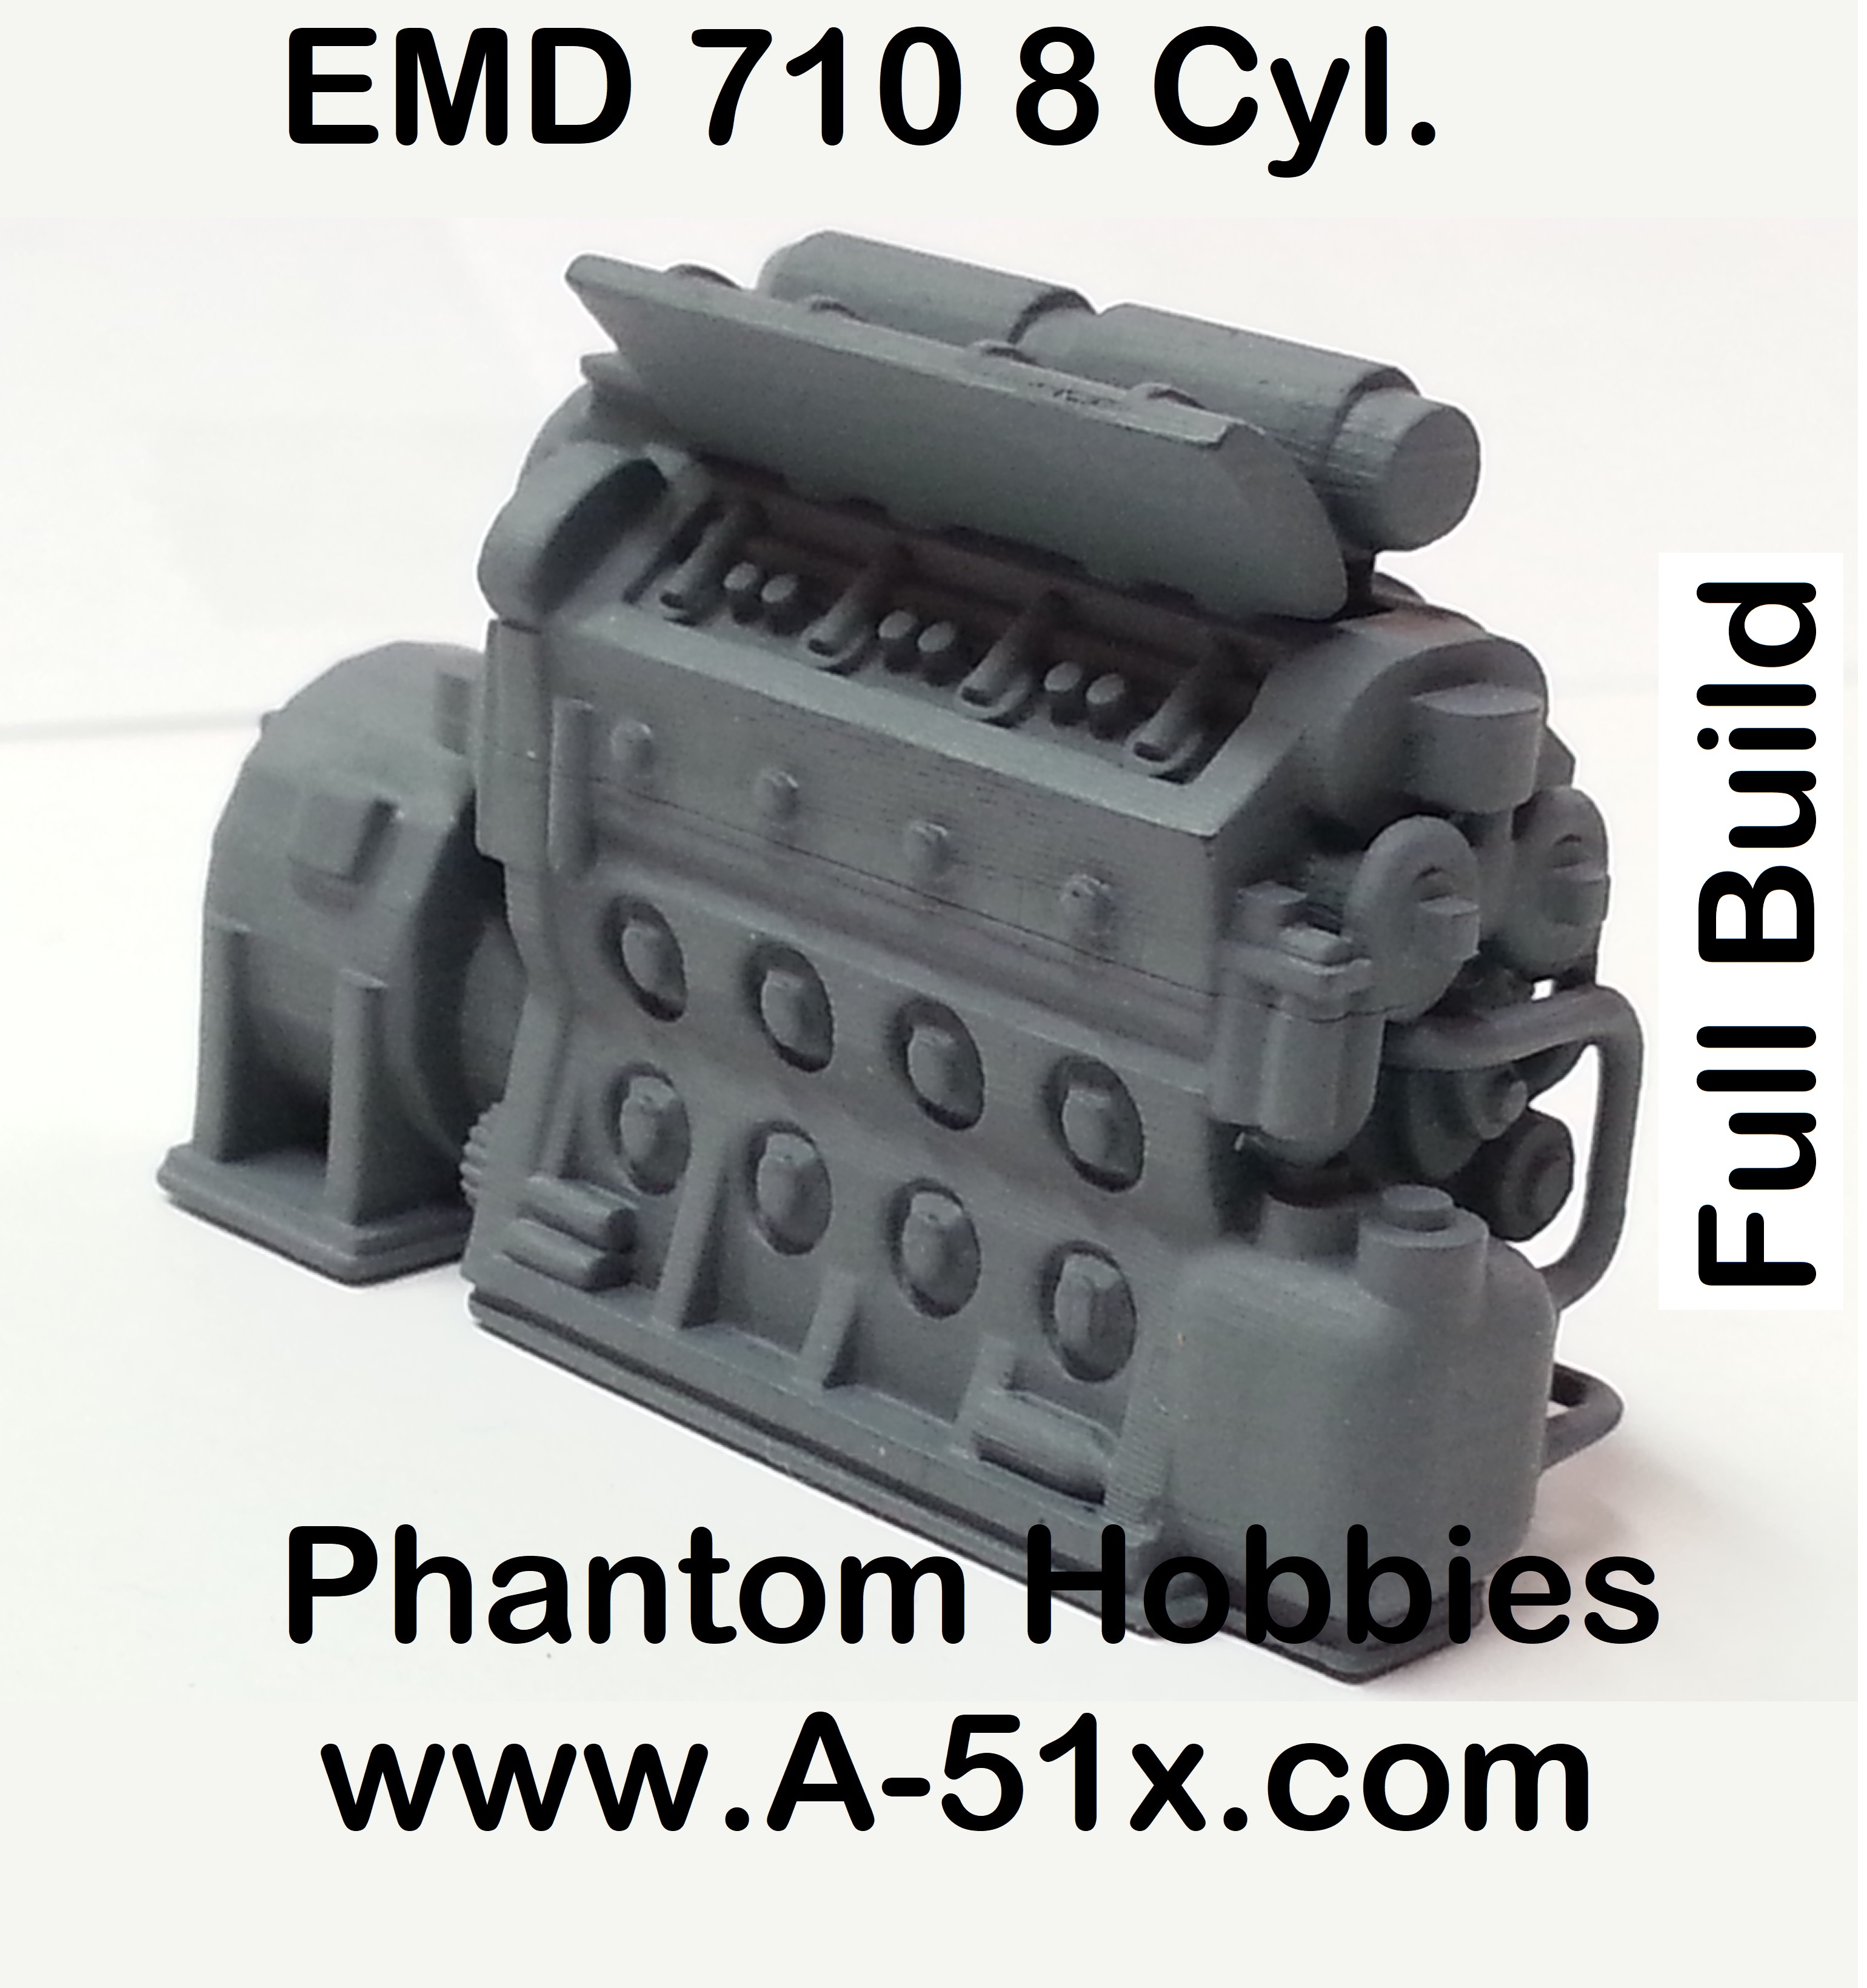 Ho scale EMD 710 8 Cyl